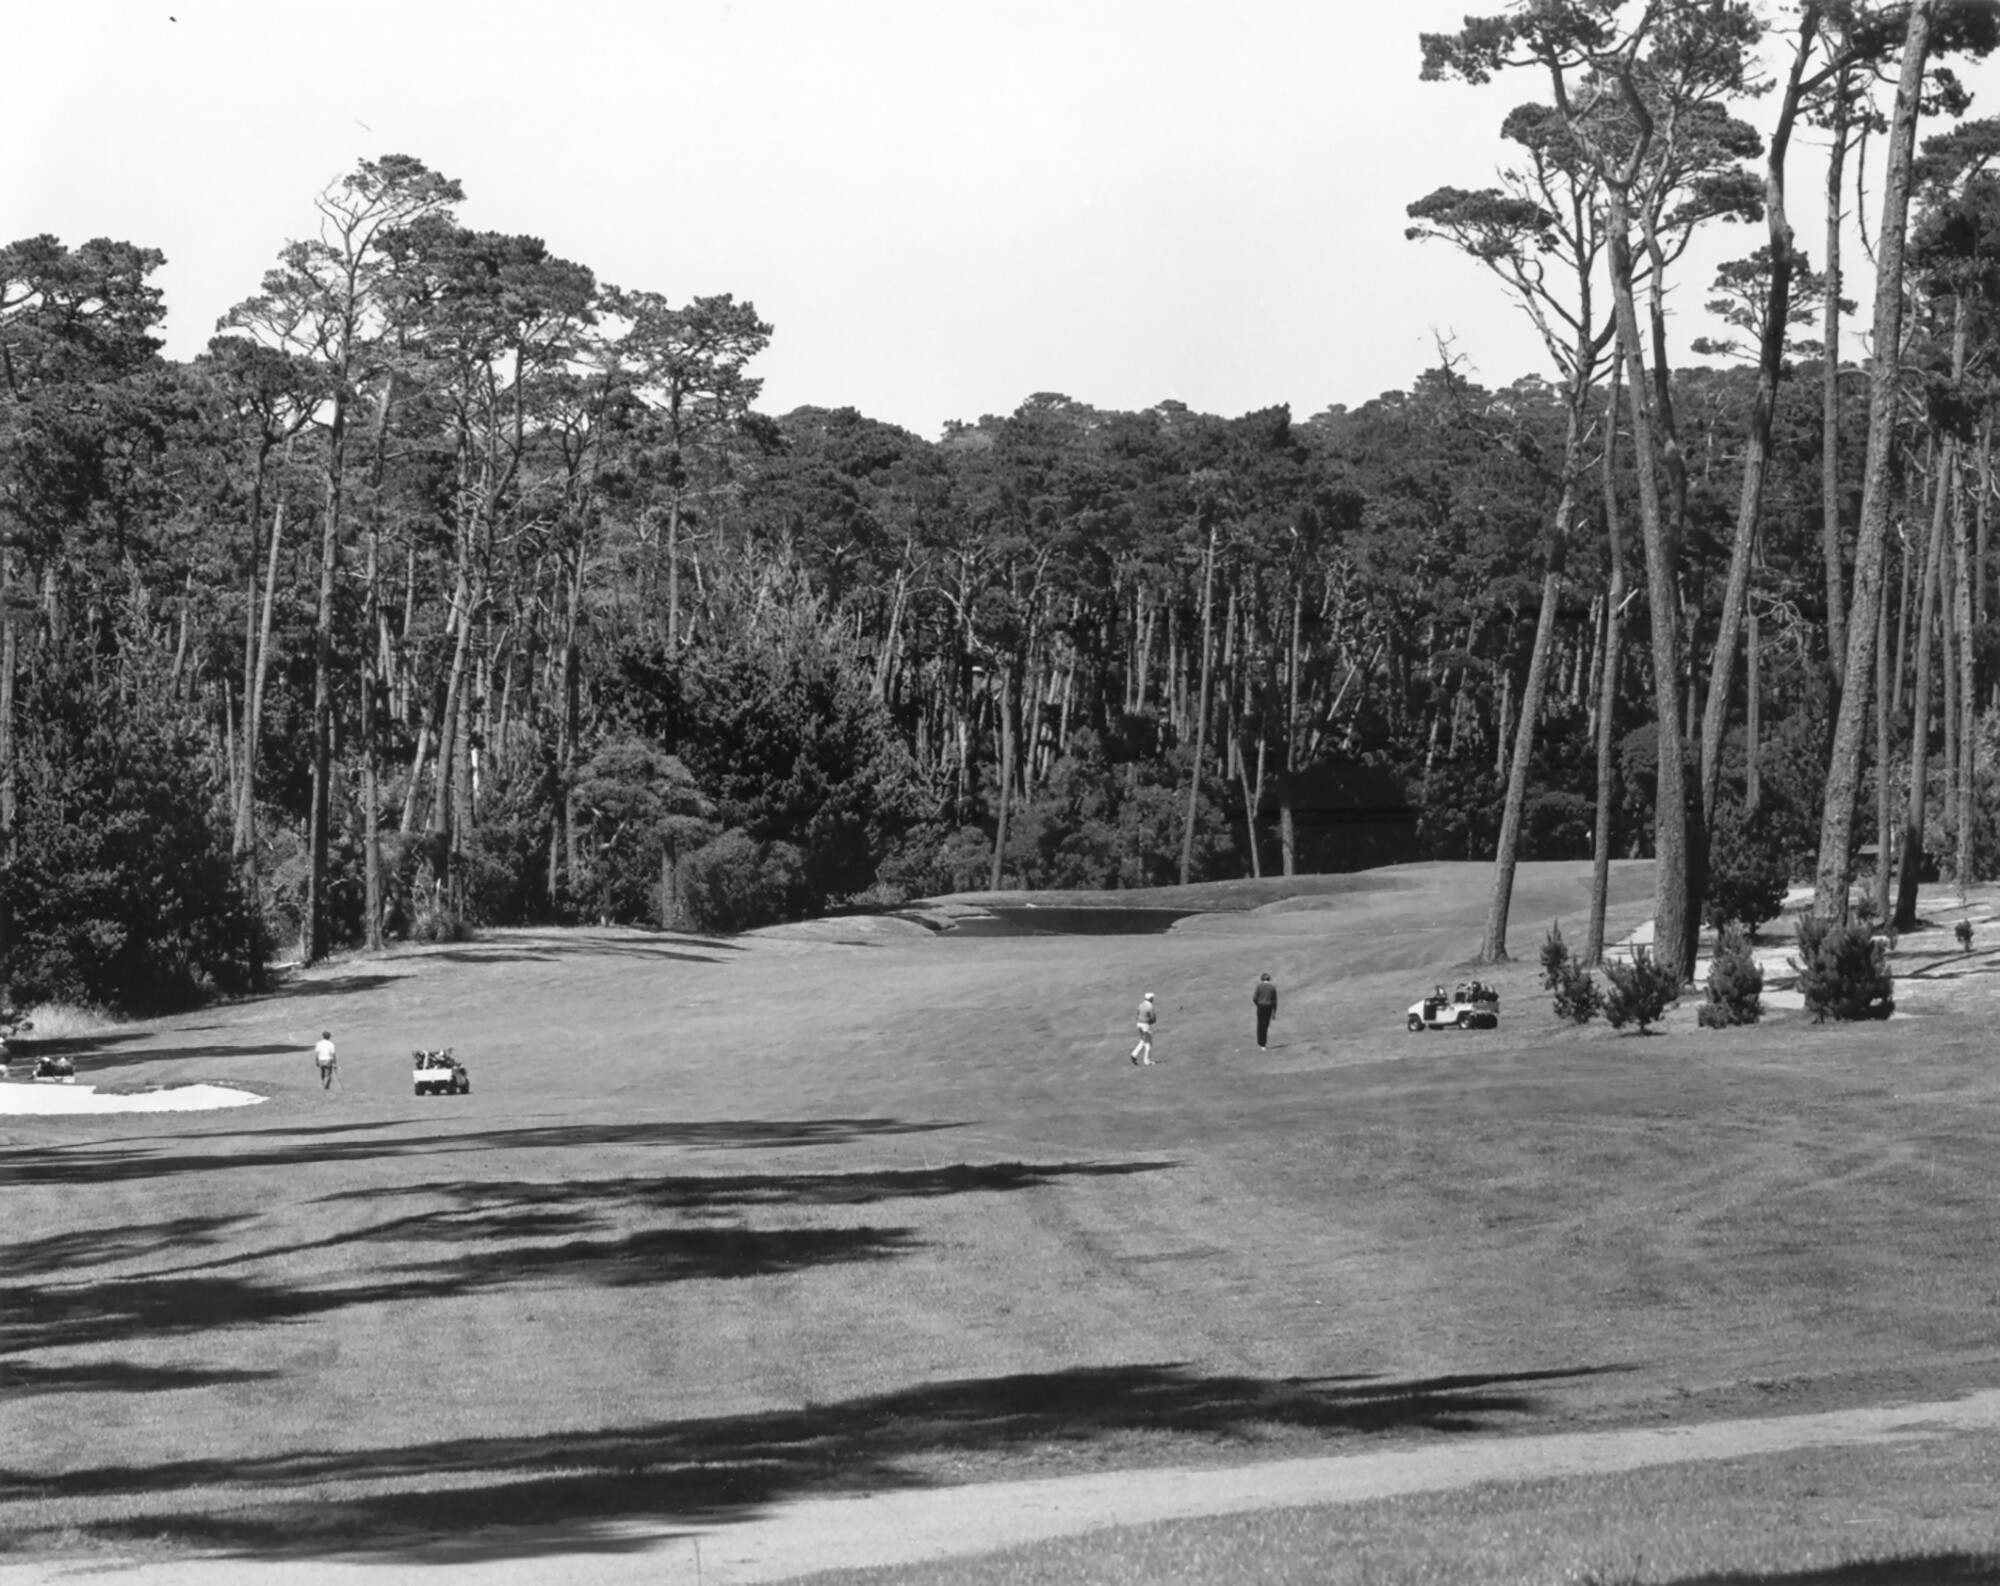 Spygl Hill Golf Course Pebble Beach Resort